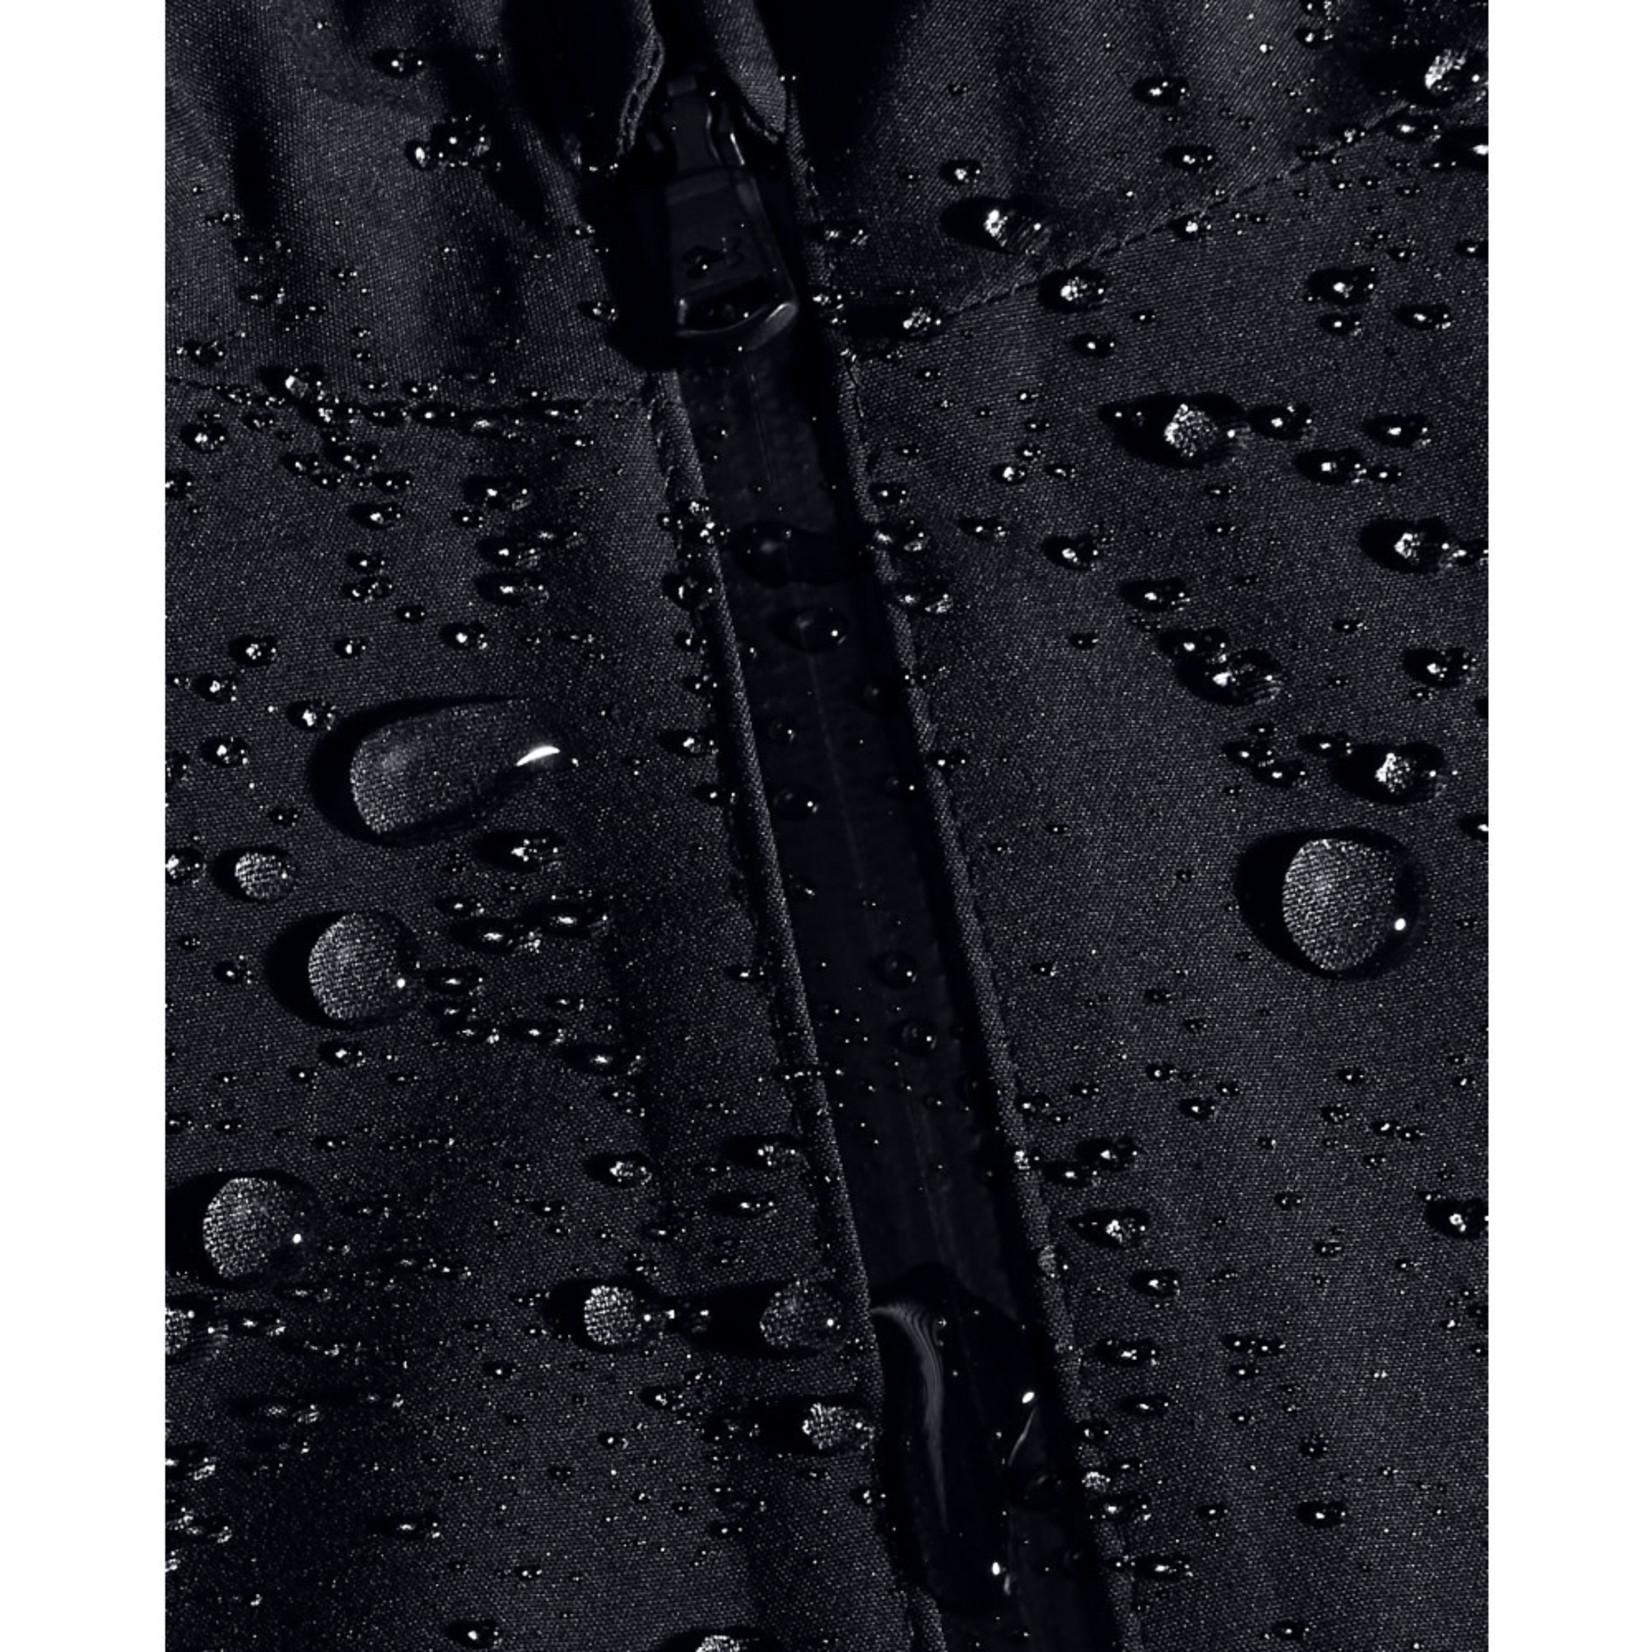 Under Armour Under Armour Elements Rain Jacket Black (WOMENS)